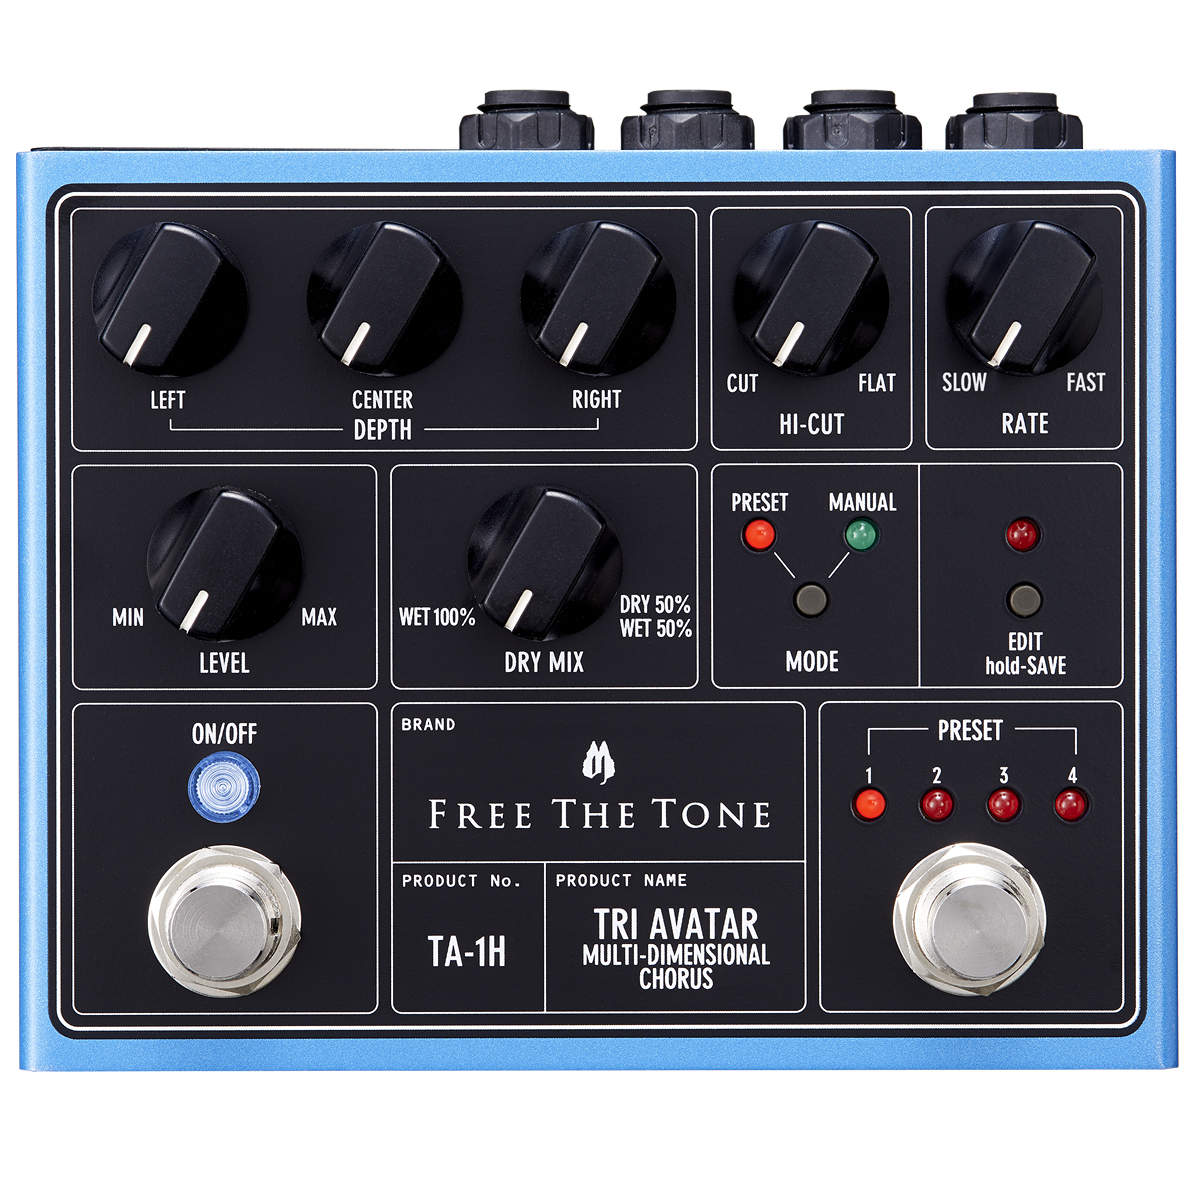 Free The Tone TA-1H TRI AVATAR Multi-Dimensional Chorus 新品 コーラス[フリーザトーン][Chorus][エフェクター,Effector]